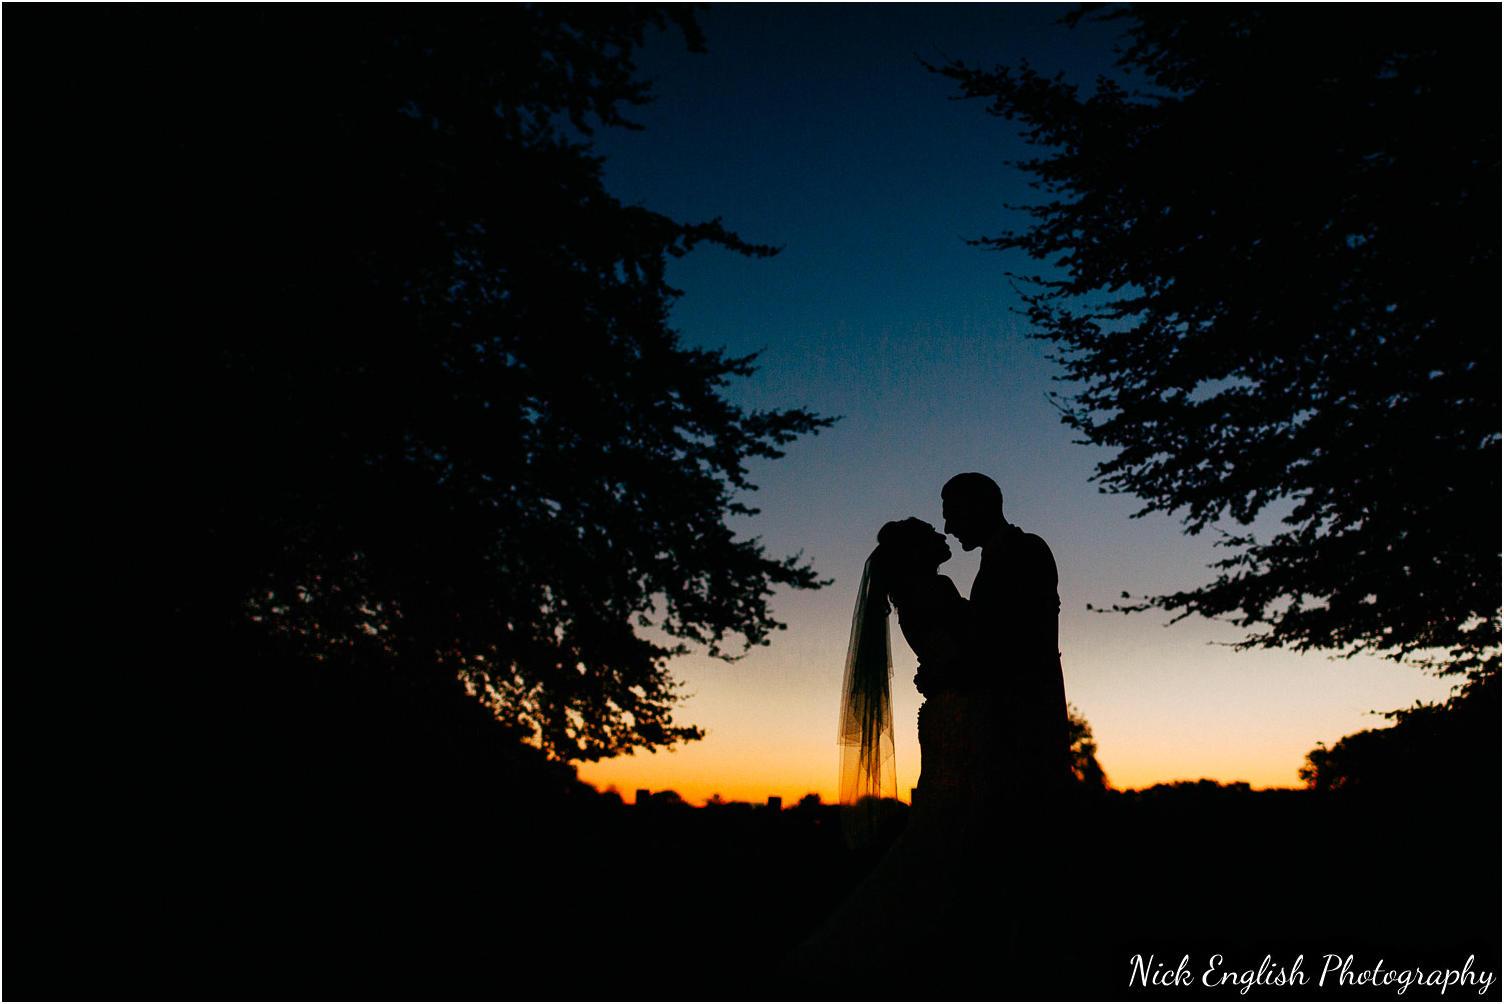 Lancashire_Wedding_Photographer-1-11.jpg